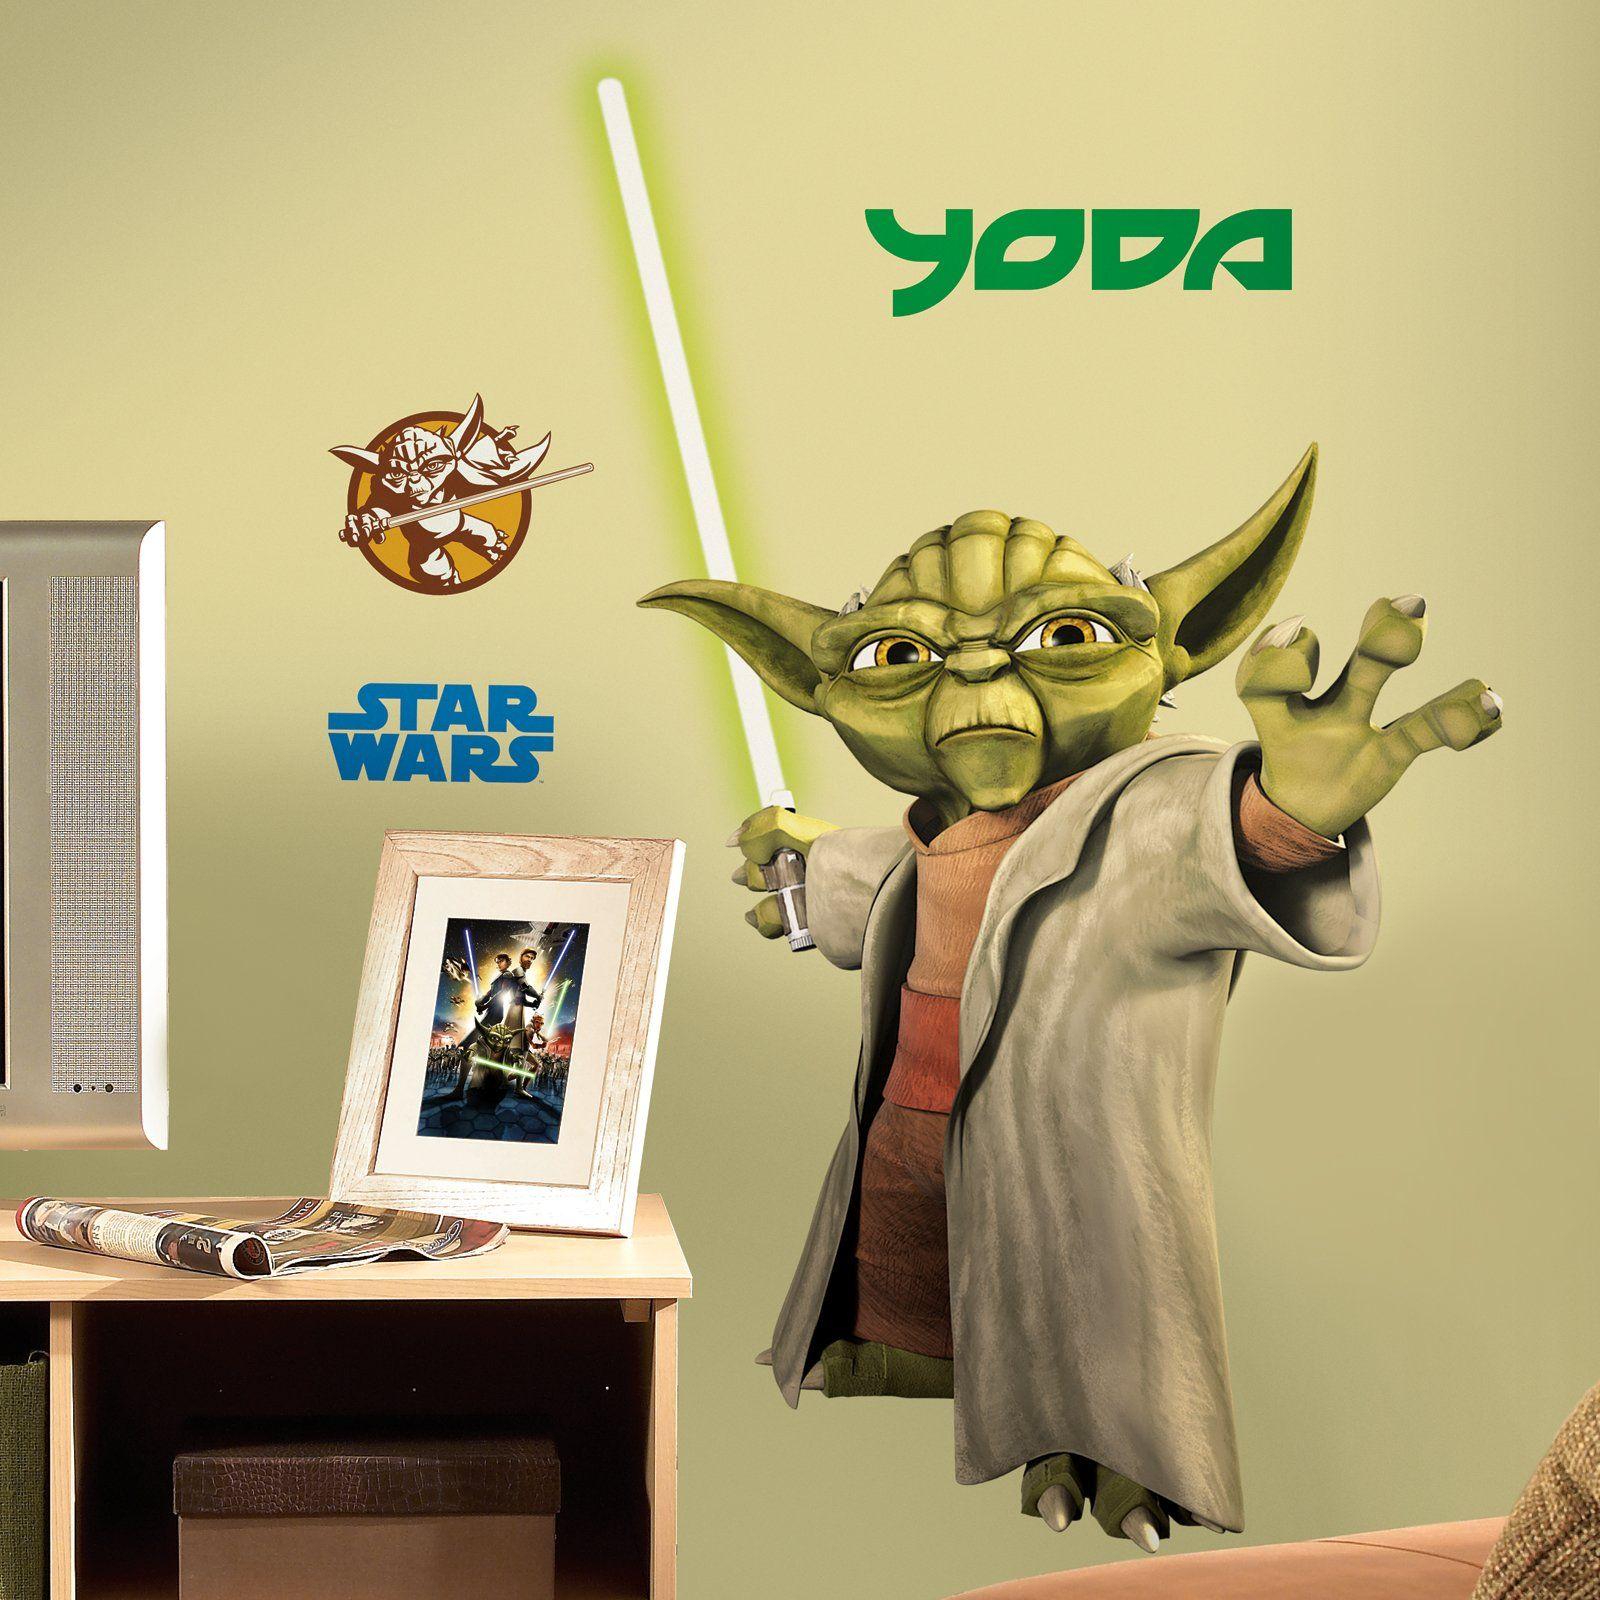 star wars bedroom | Star Wars Yoda Bedroom Wall Decal Party ...